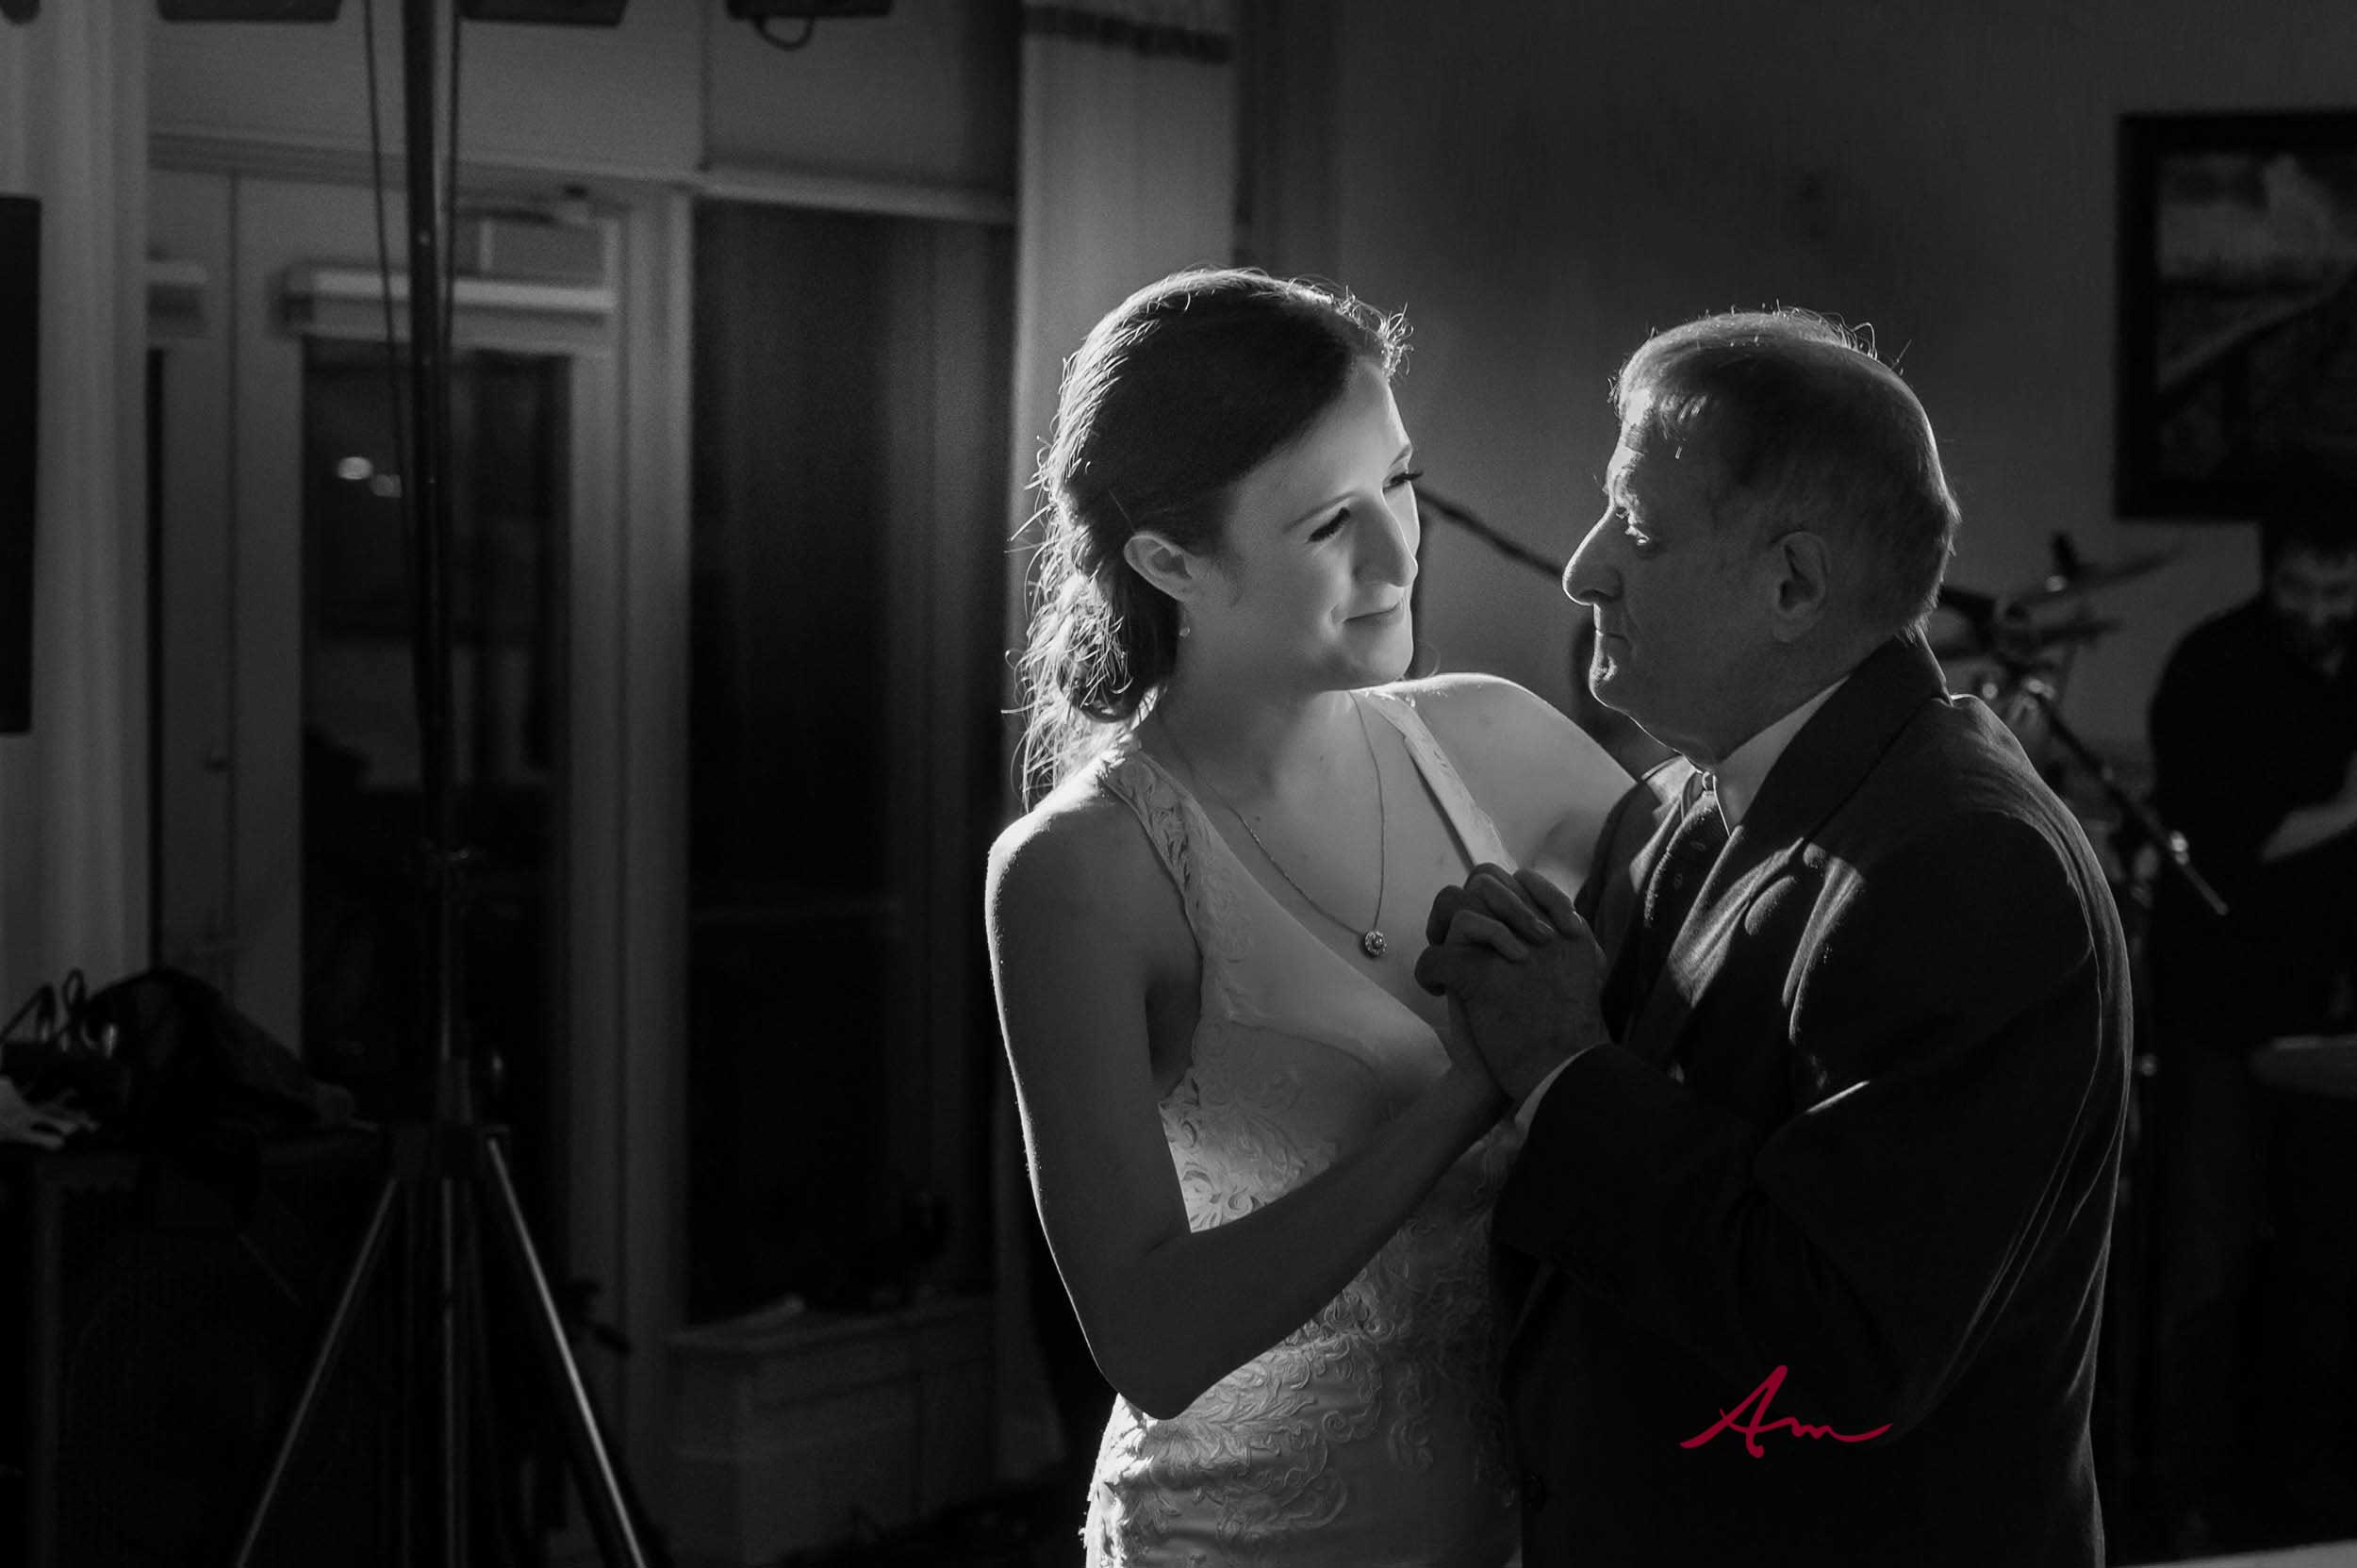 Fox-Harb'r-Wedding-Bride-Grandfather-Dance.JPG